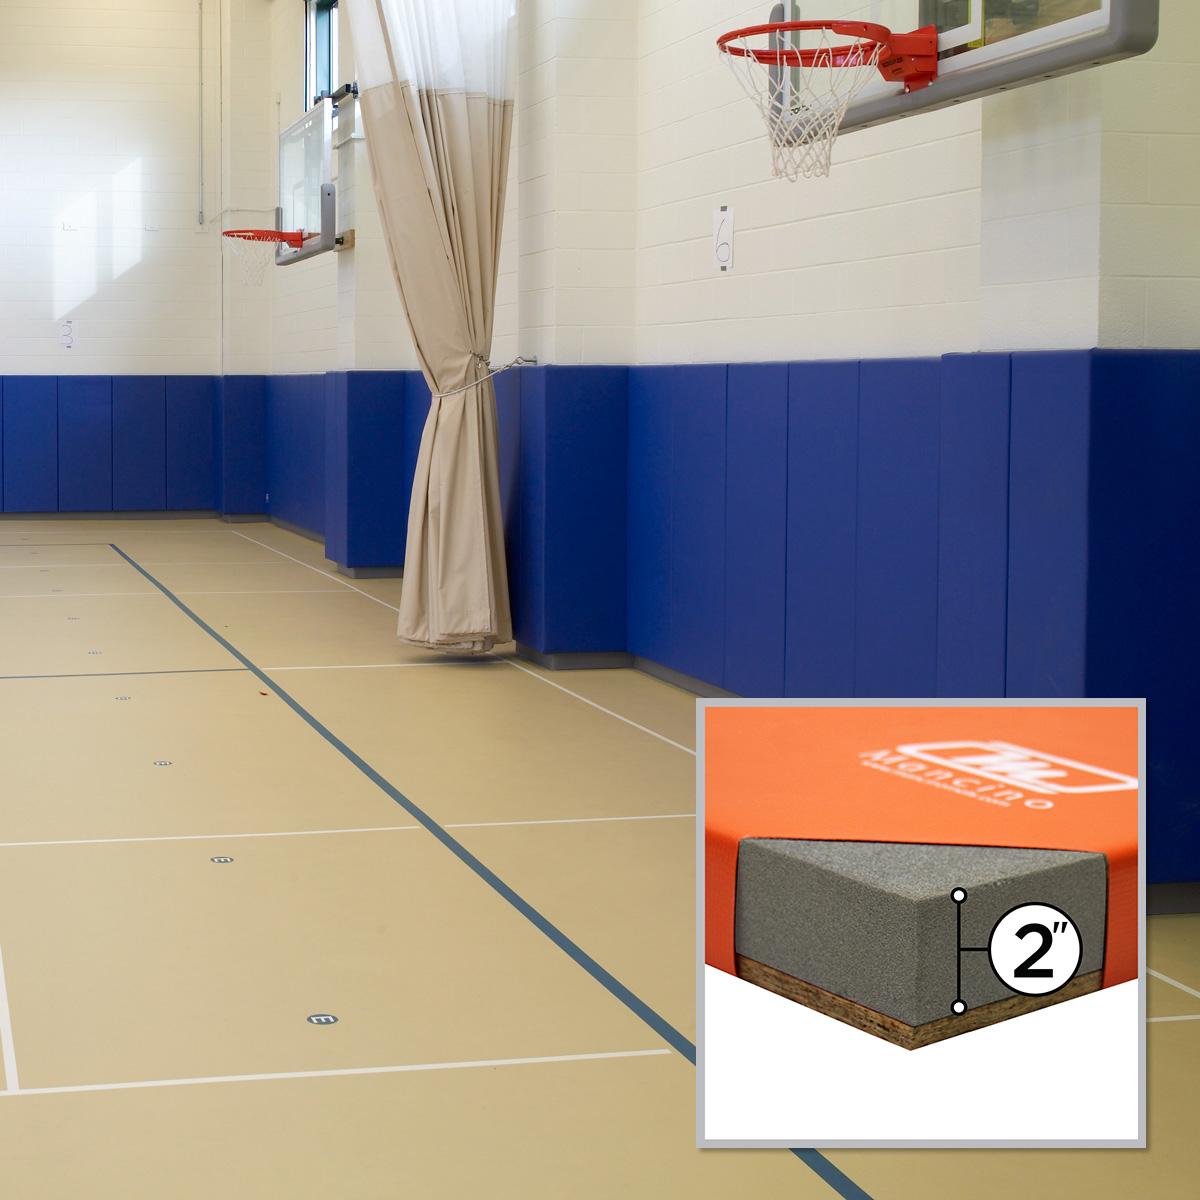 gymnasium with divider curtain and royal blue wall padding by mancino